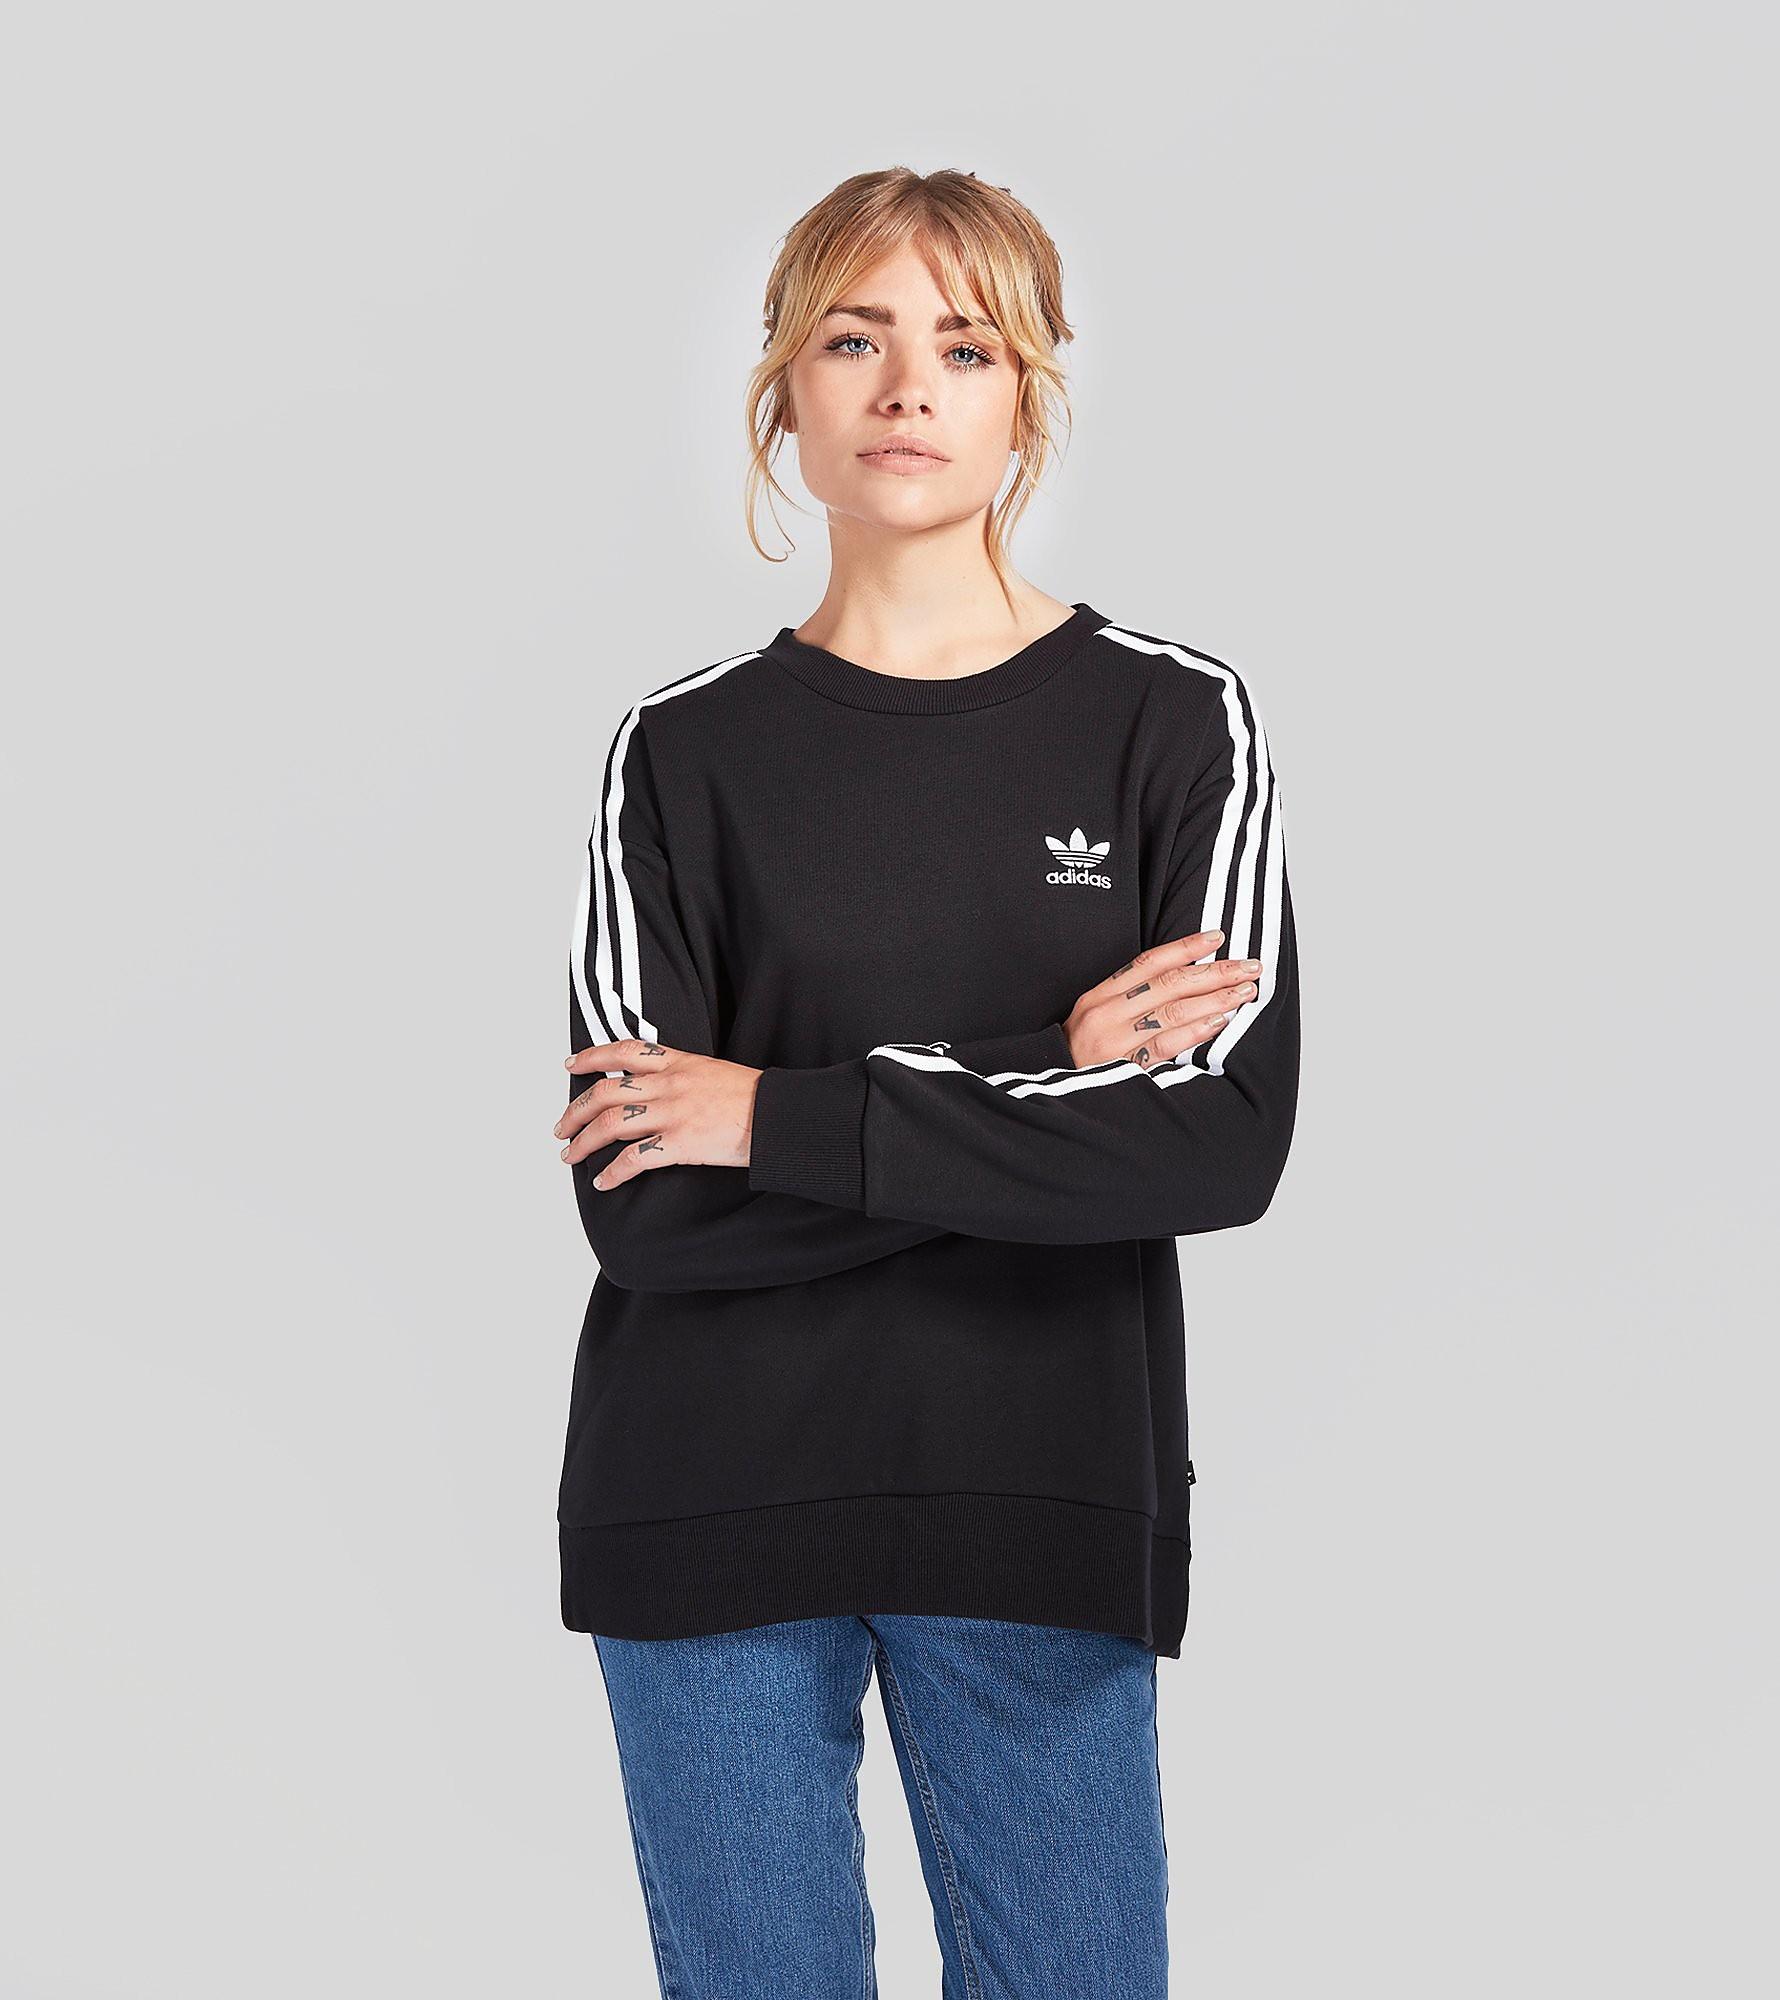 adidas Originals 3 Stripes Sweatshirt